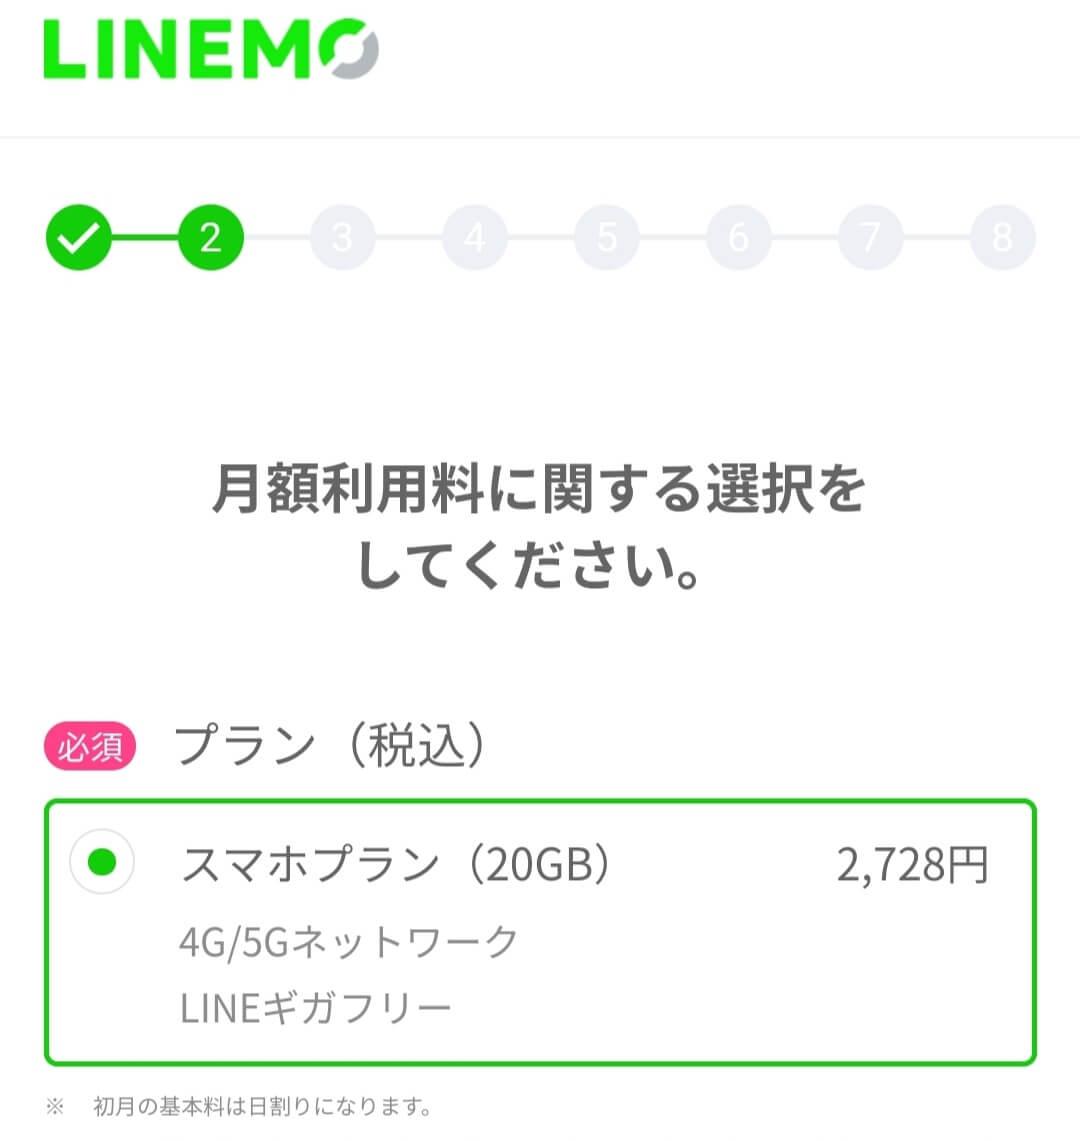 LINEMOのスマホプラン